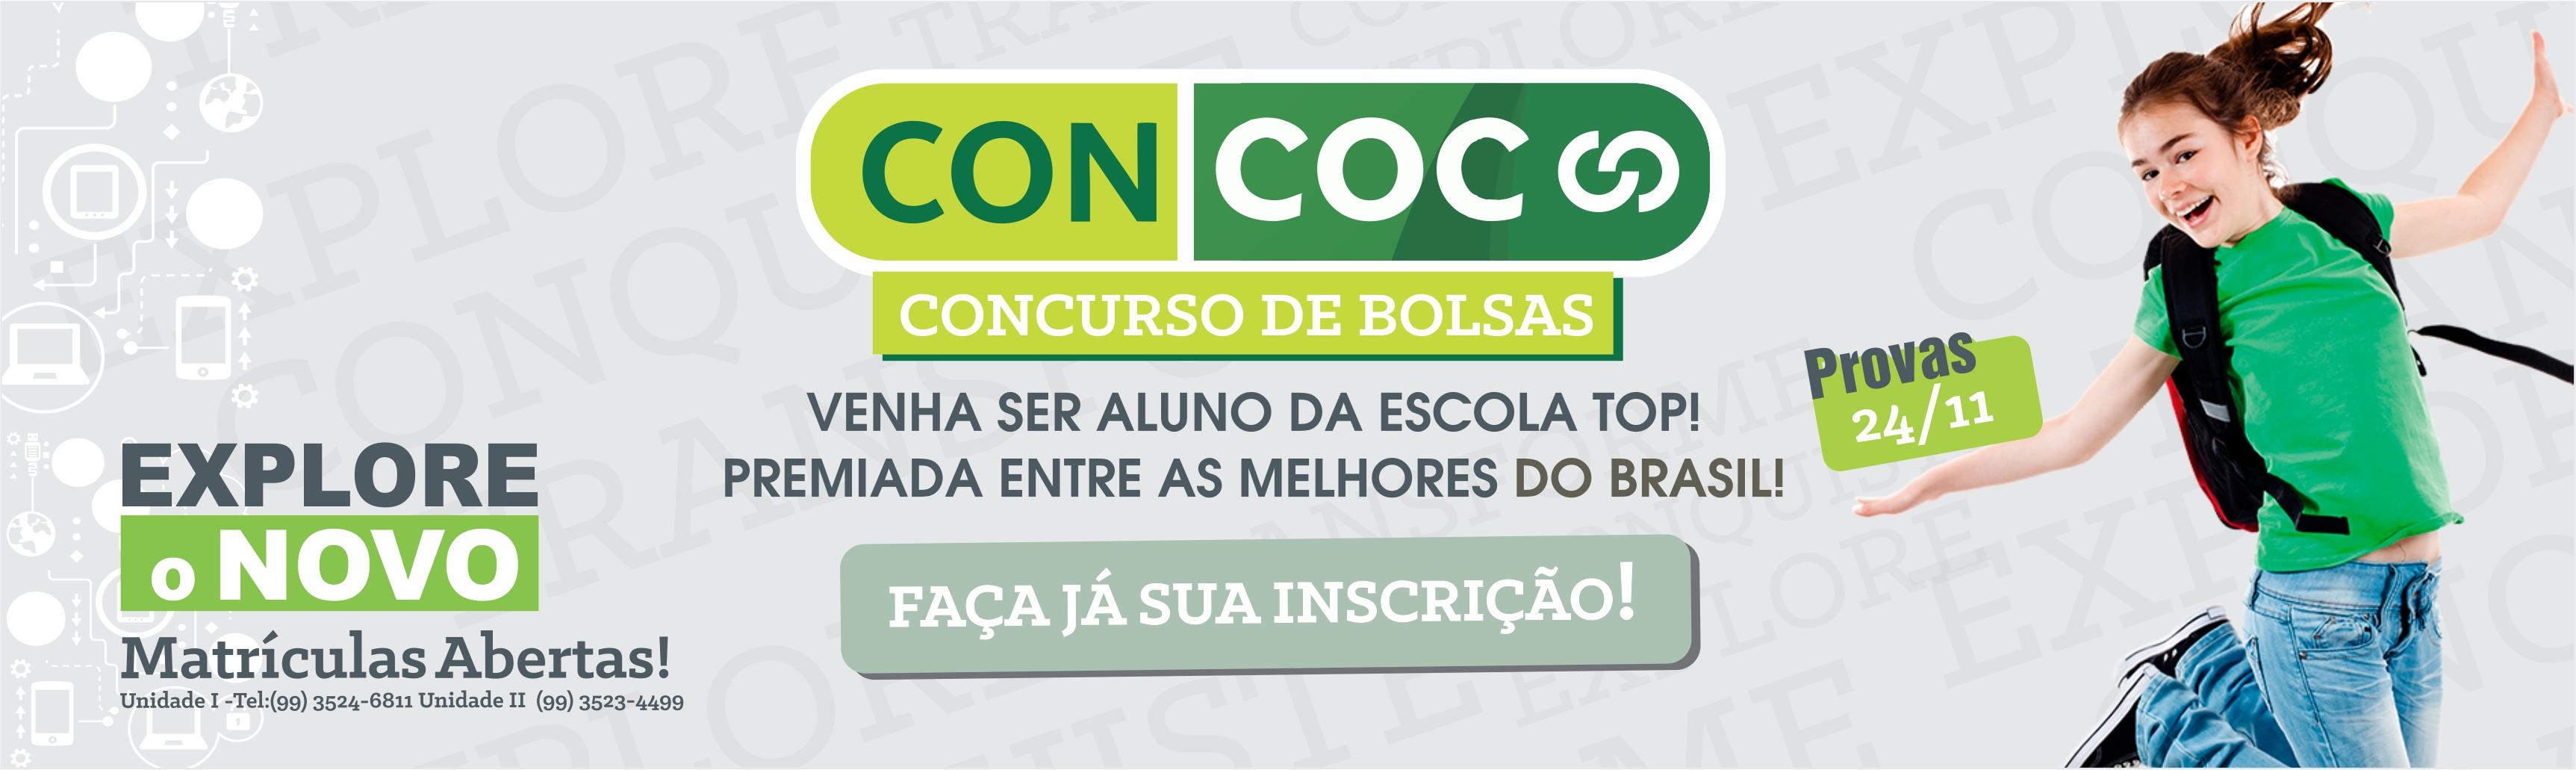 BANNER-CONCOC-2018-SITE-2